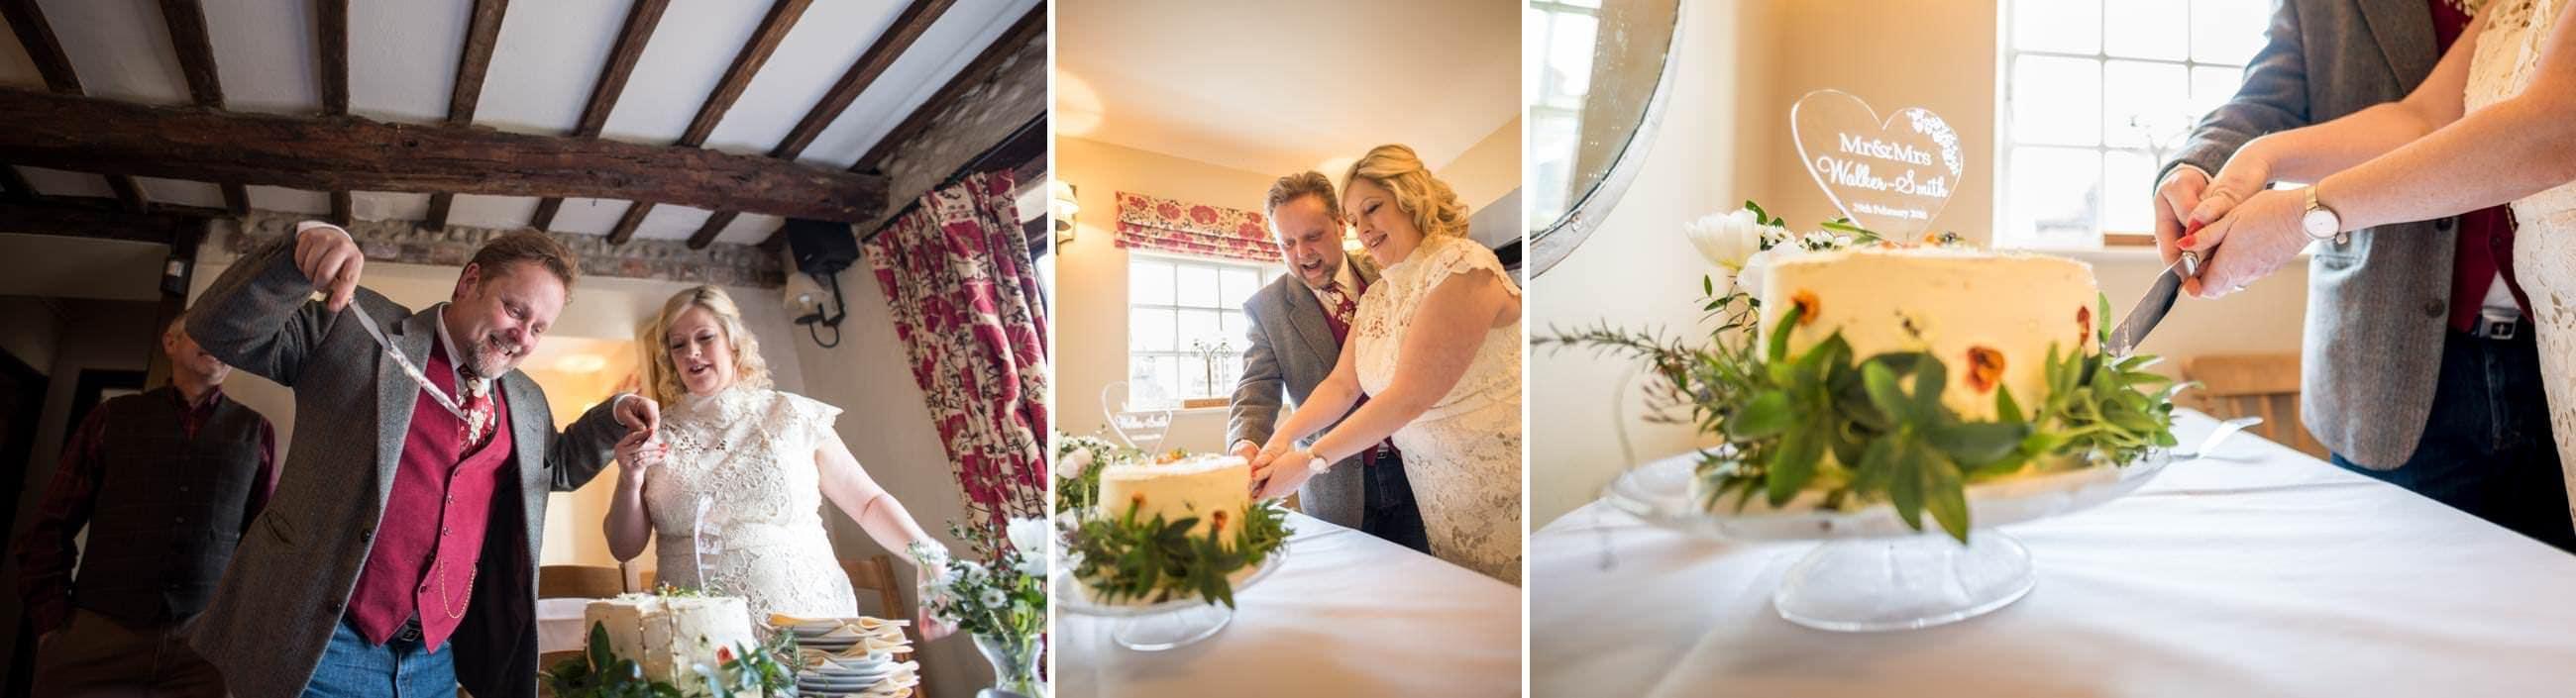 Nicola_Andy_Cley_Windmill_Norfolk_Wedding 11